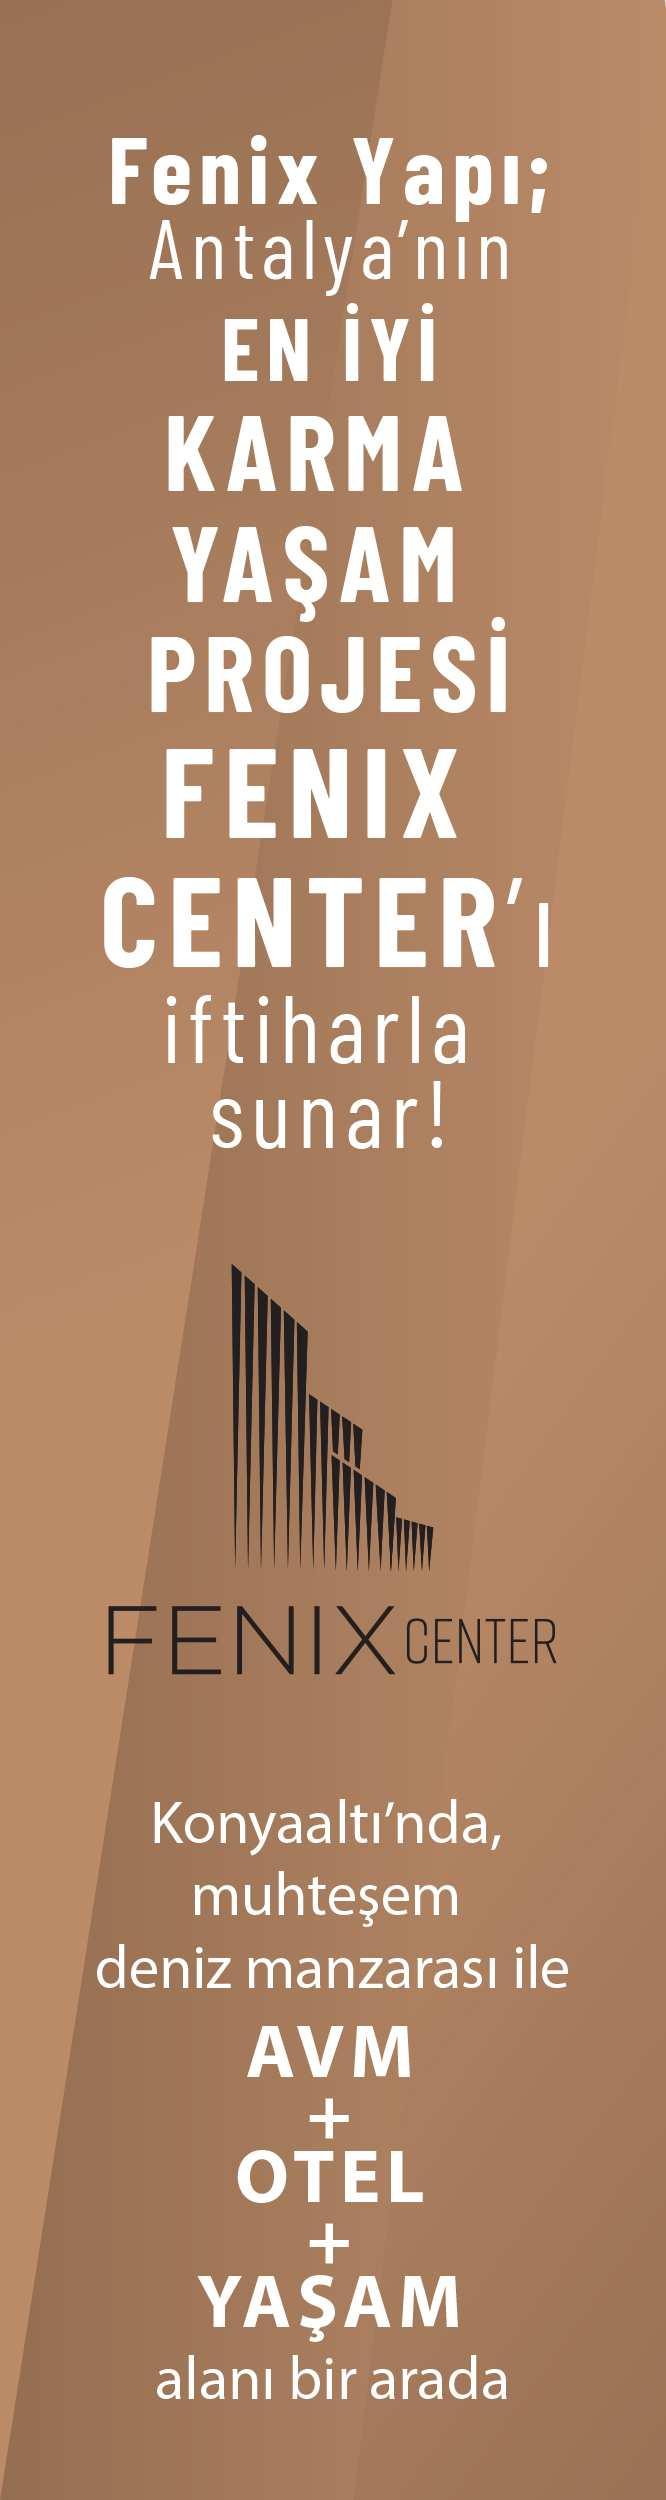 Fenix center